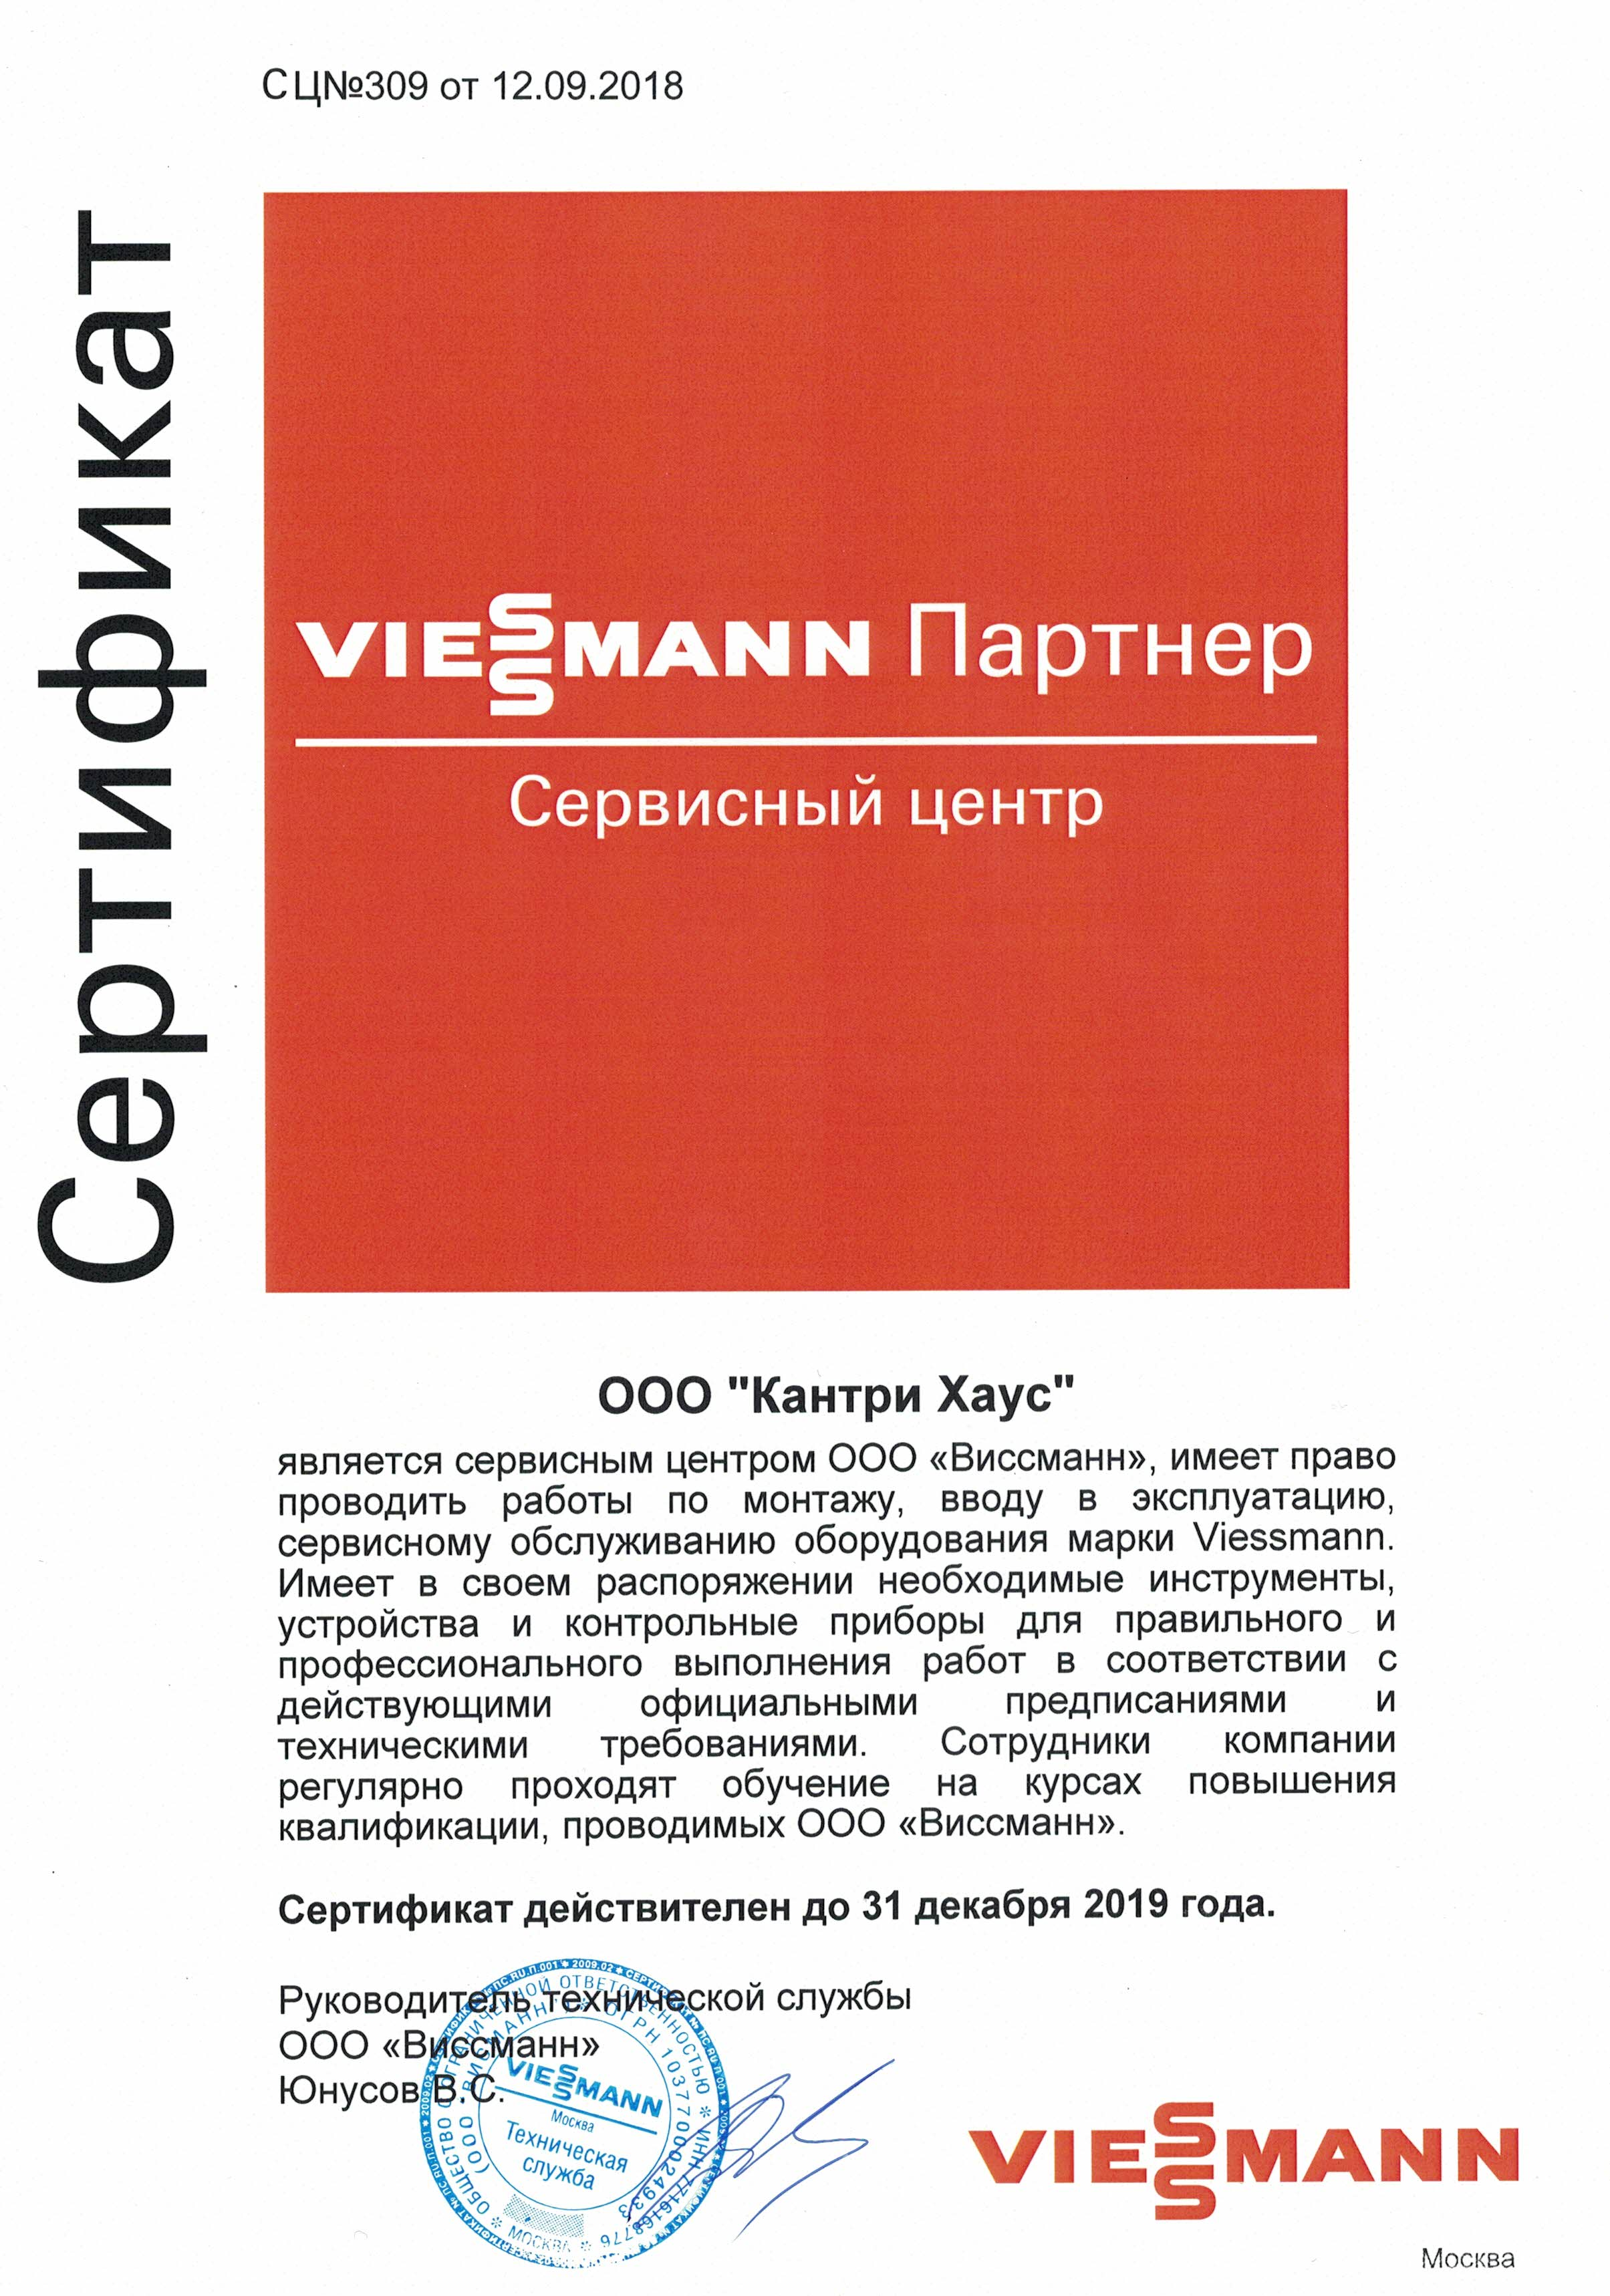 Сертификат_Сервисного_центра_Кантри_Хаус.jpg